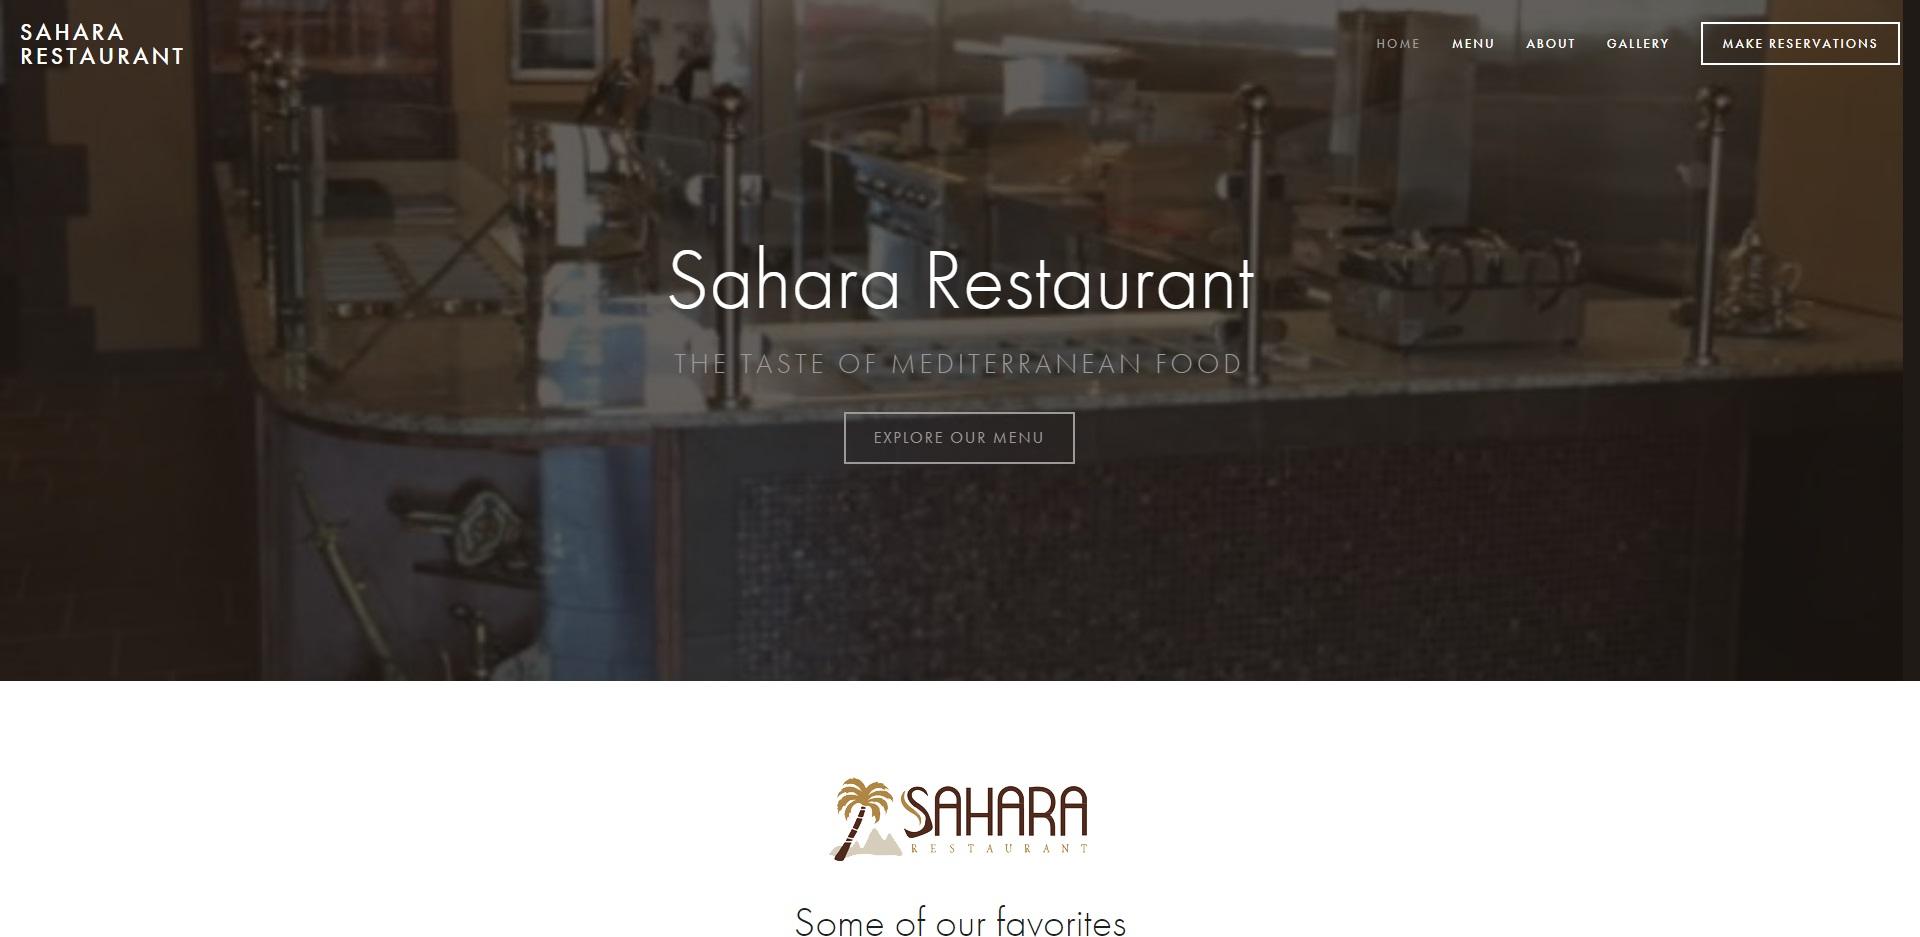 The Best Turkish Restaurants in Indianapolis